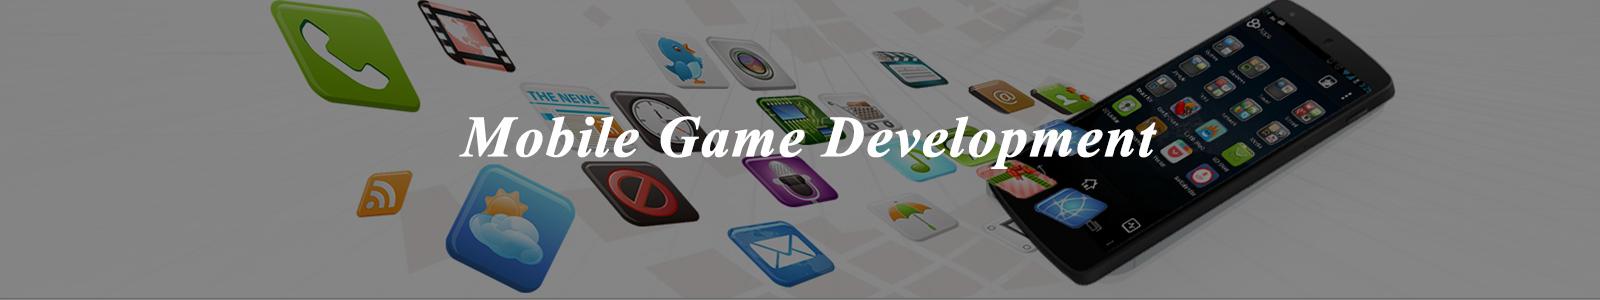 mobile-game-banner